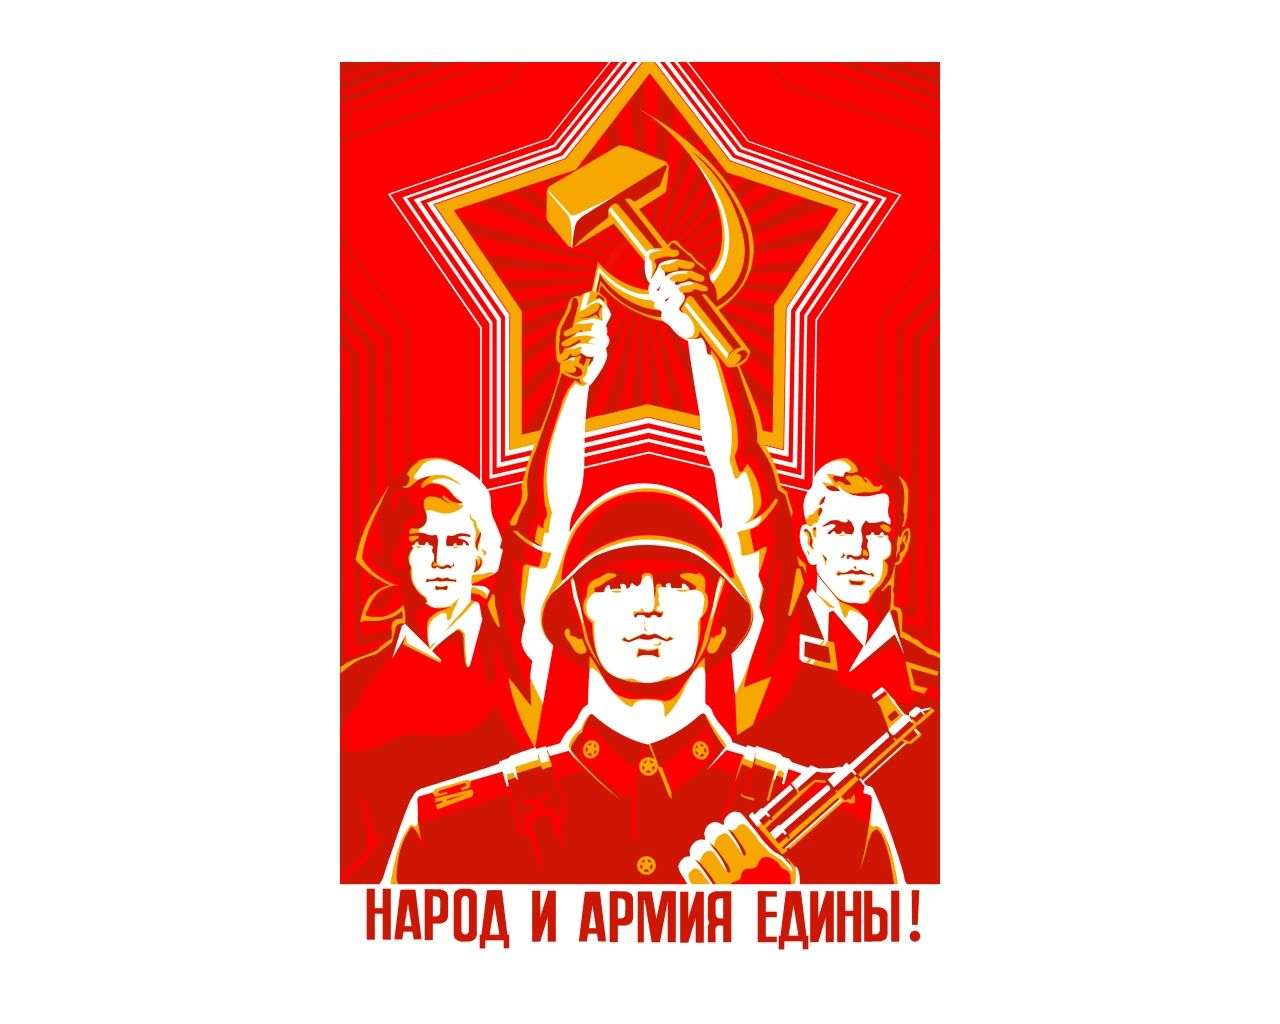 Pin By Maayan Yehoshua On Soviet Propaganda Cold War Propaganda